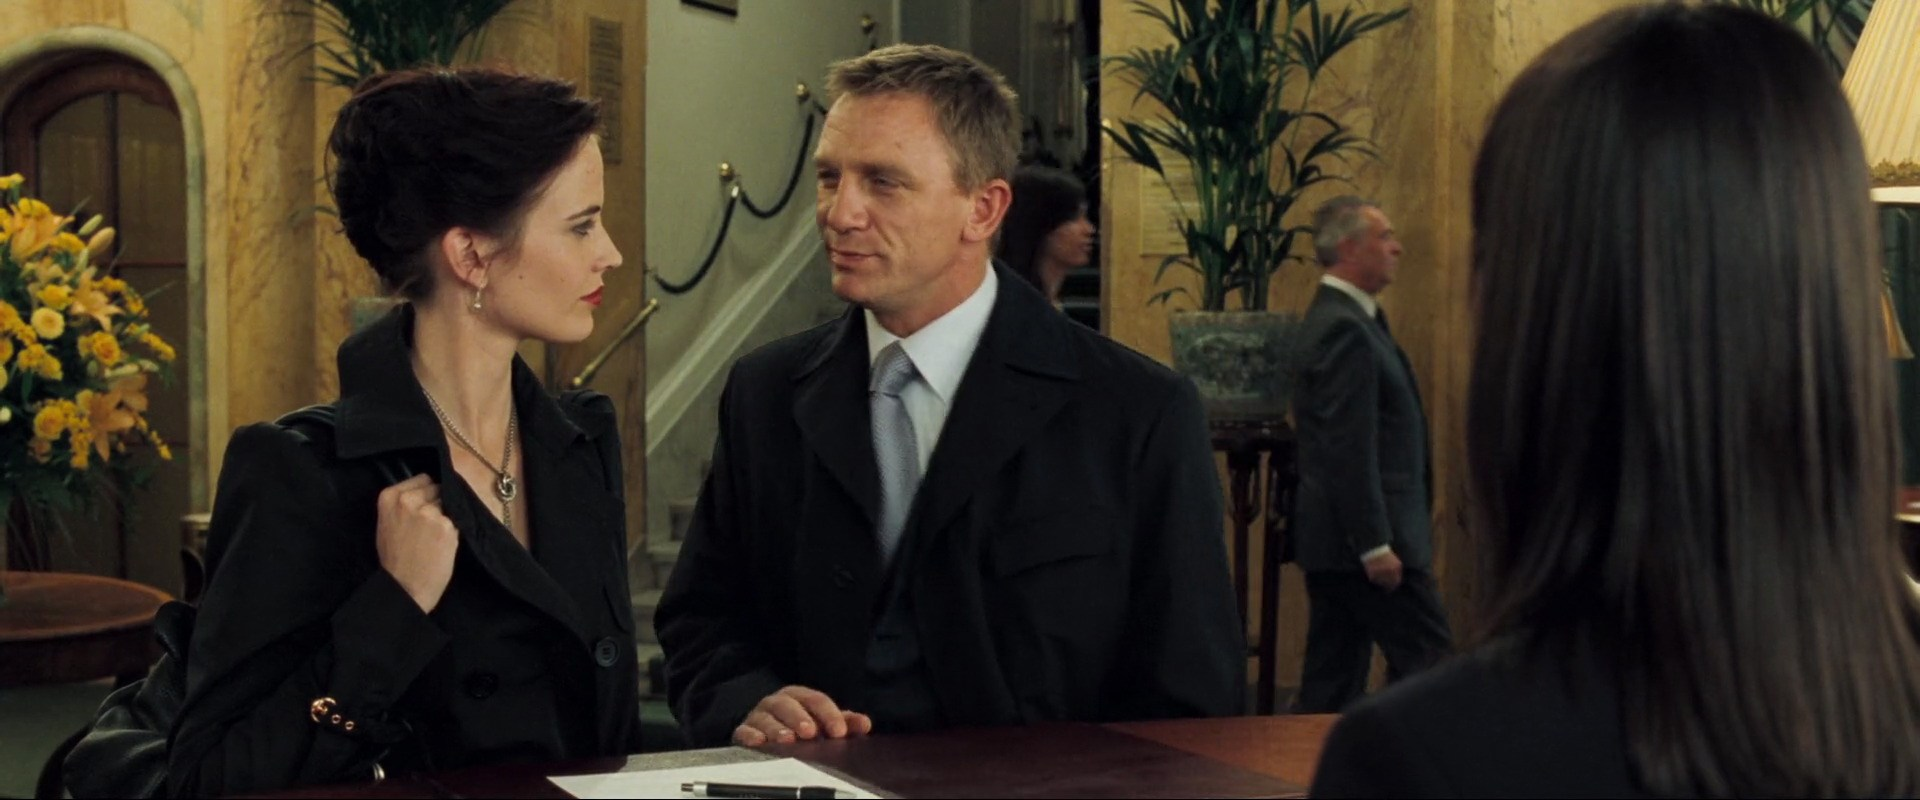 Daniel Craig and Eva Green in Casino Royale (2006)